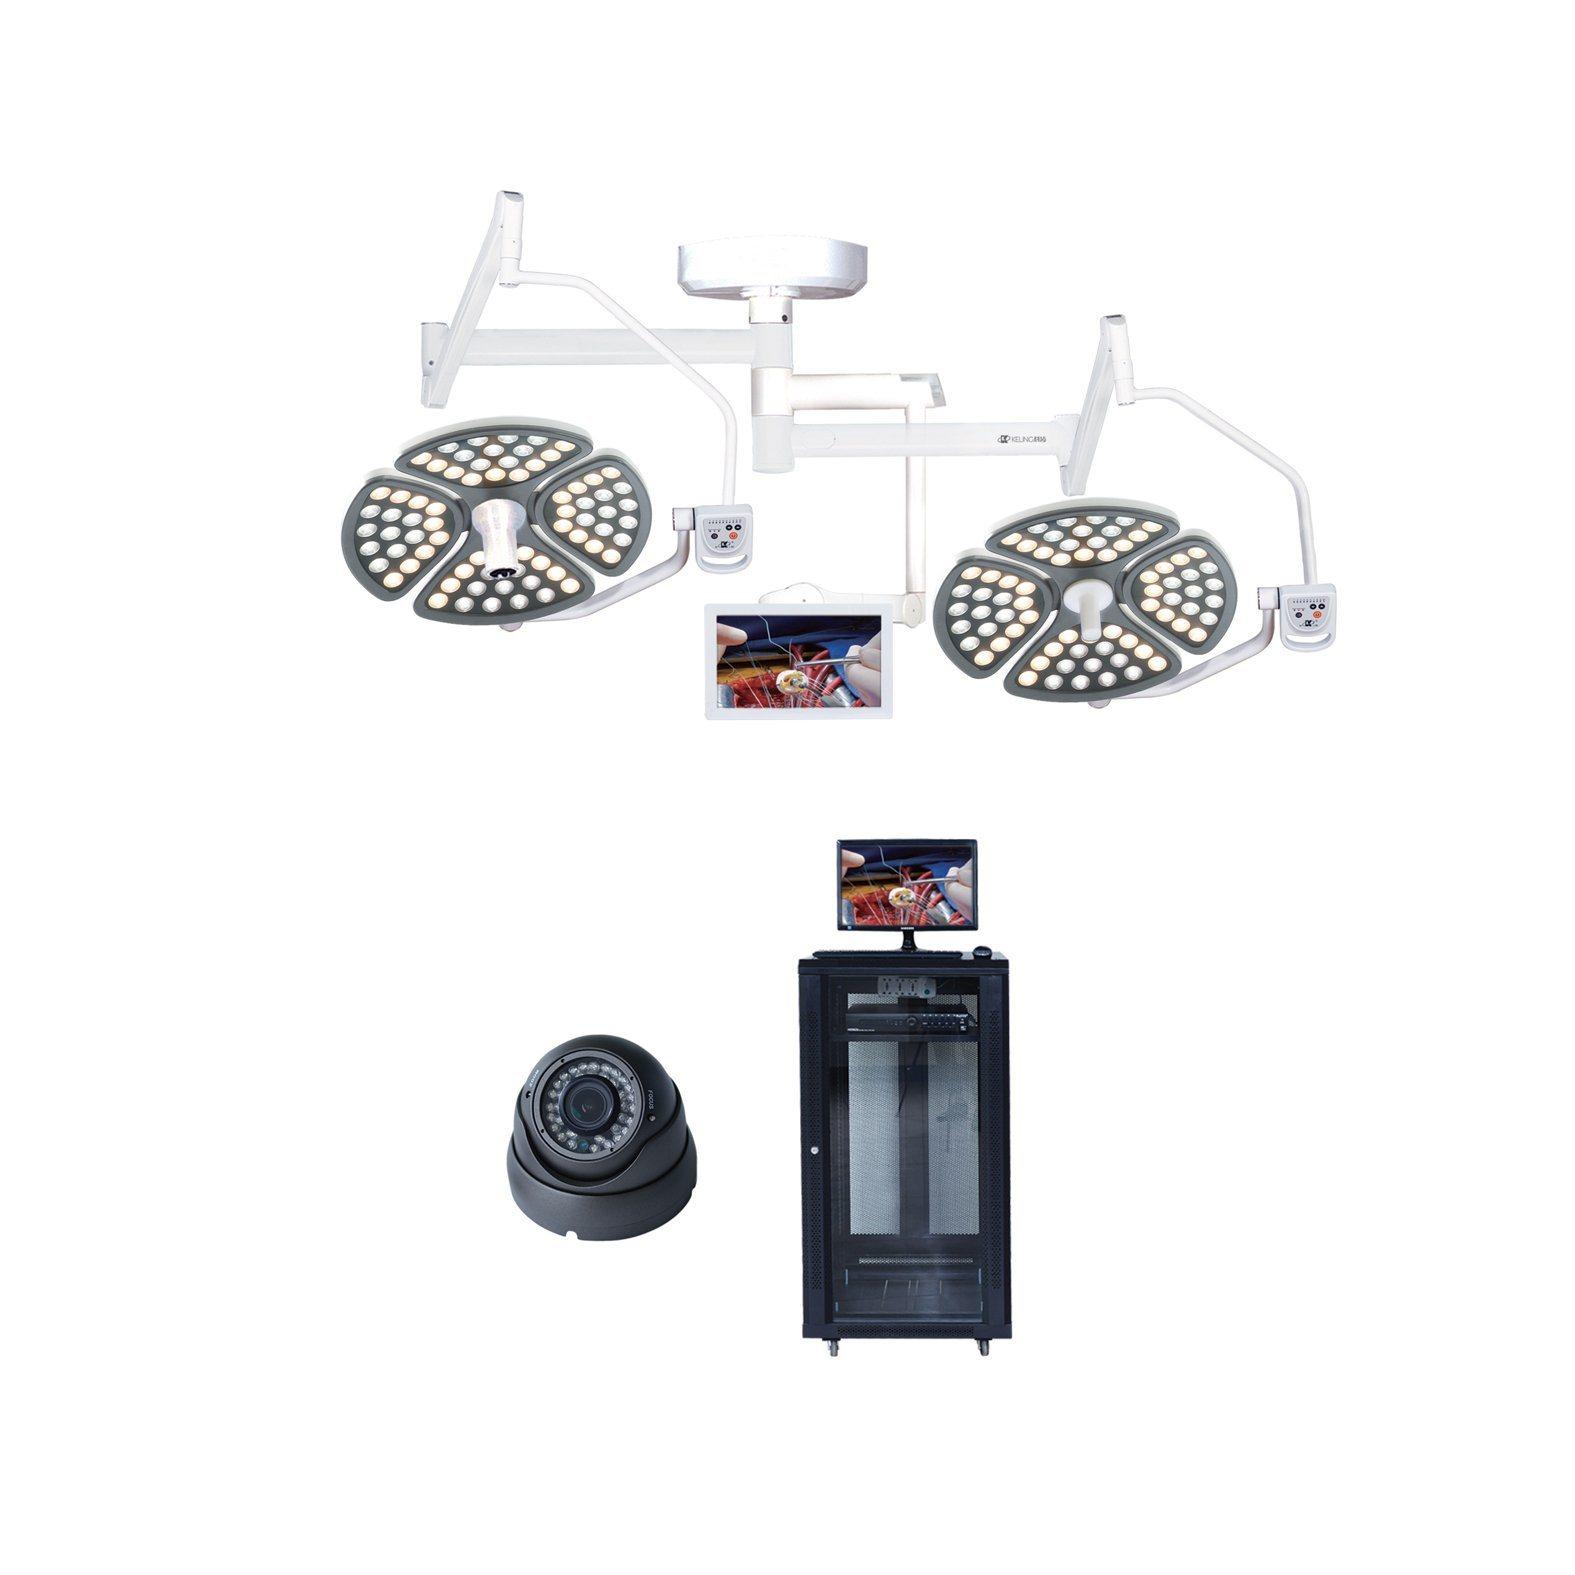 LED400/400t LED Surgical Light